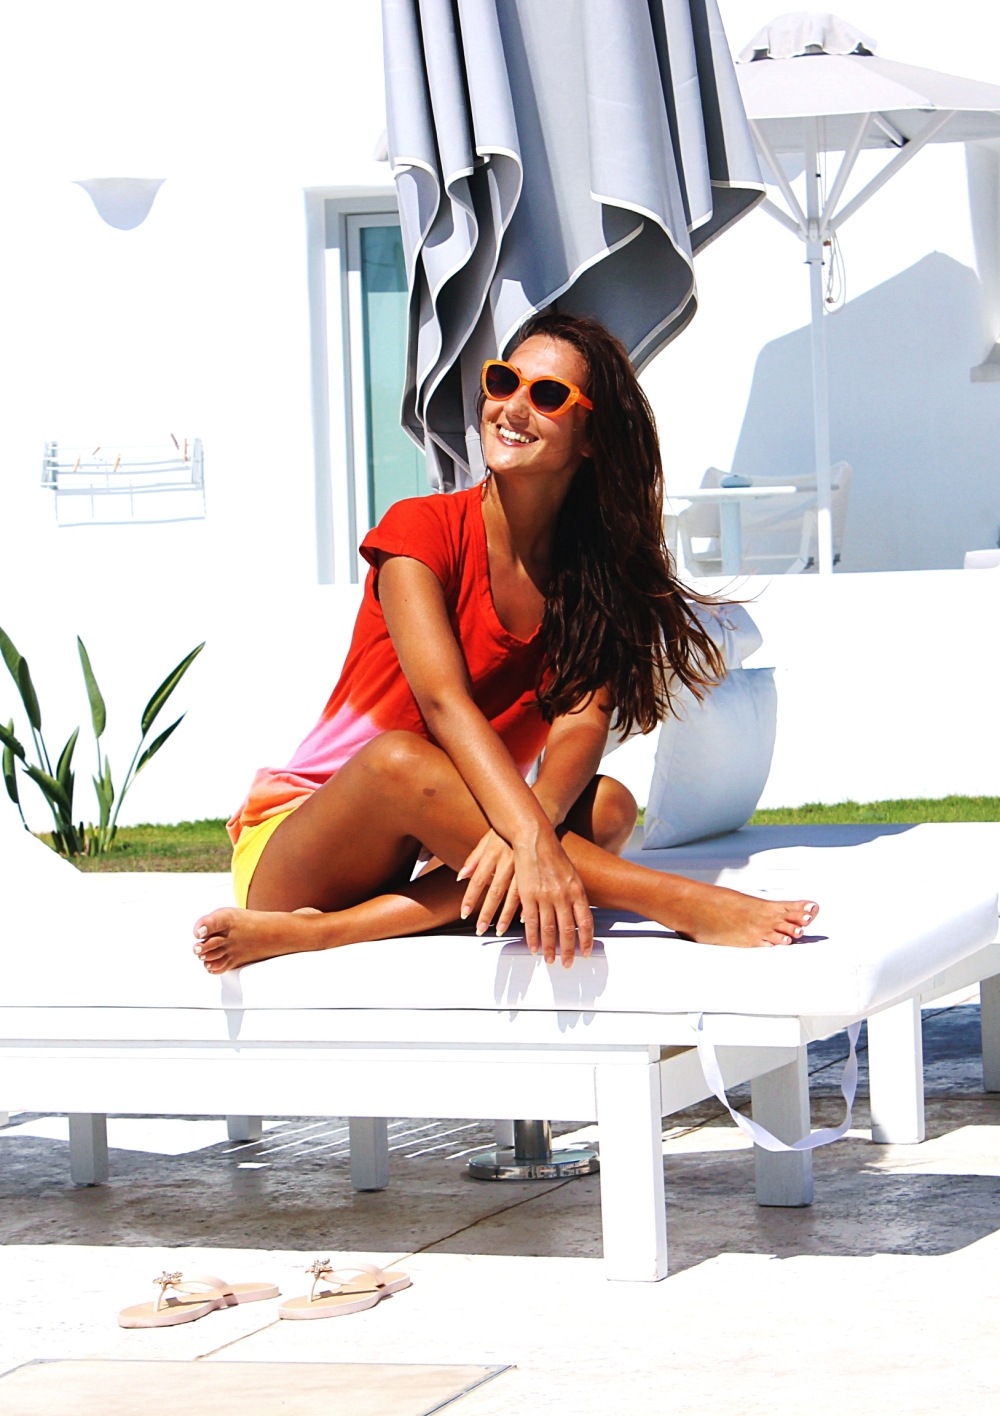 travel blogger lifestyle, happy travel girl, wanderlust summer vibes